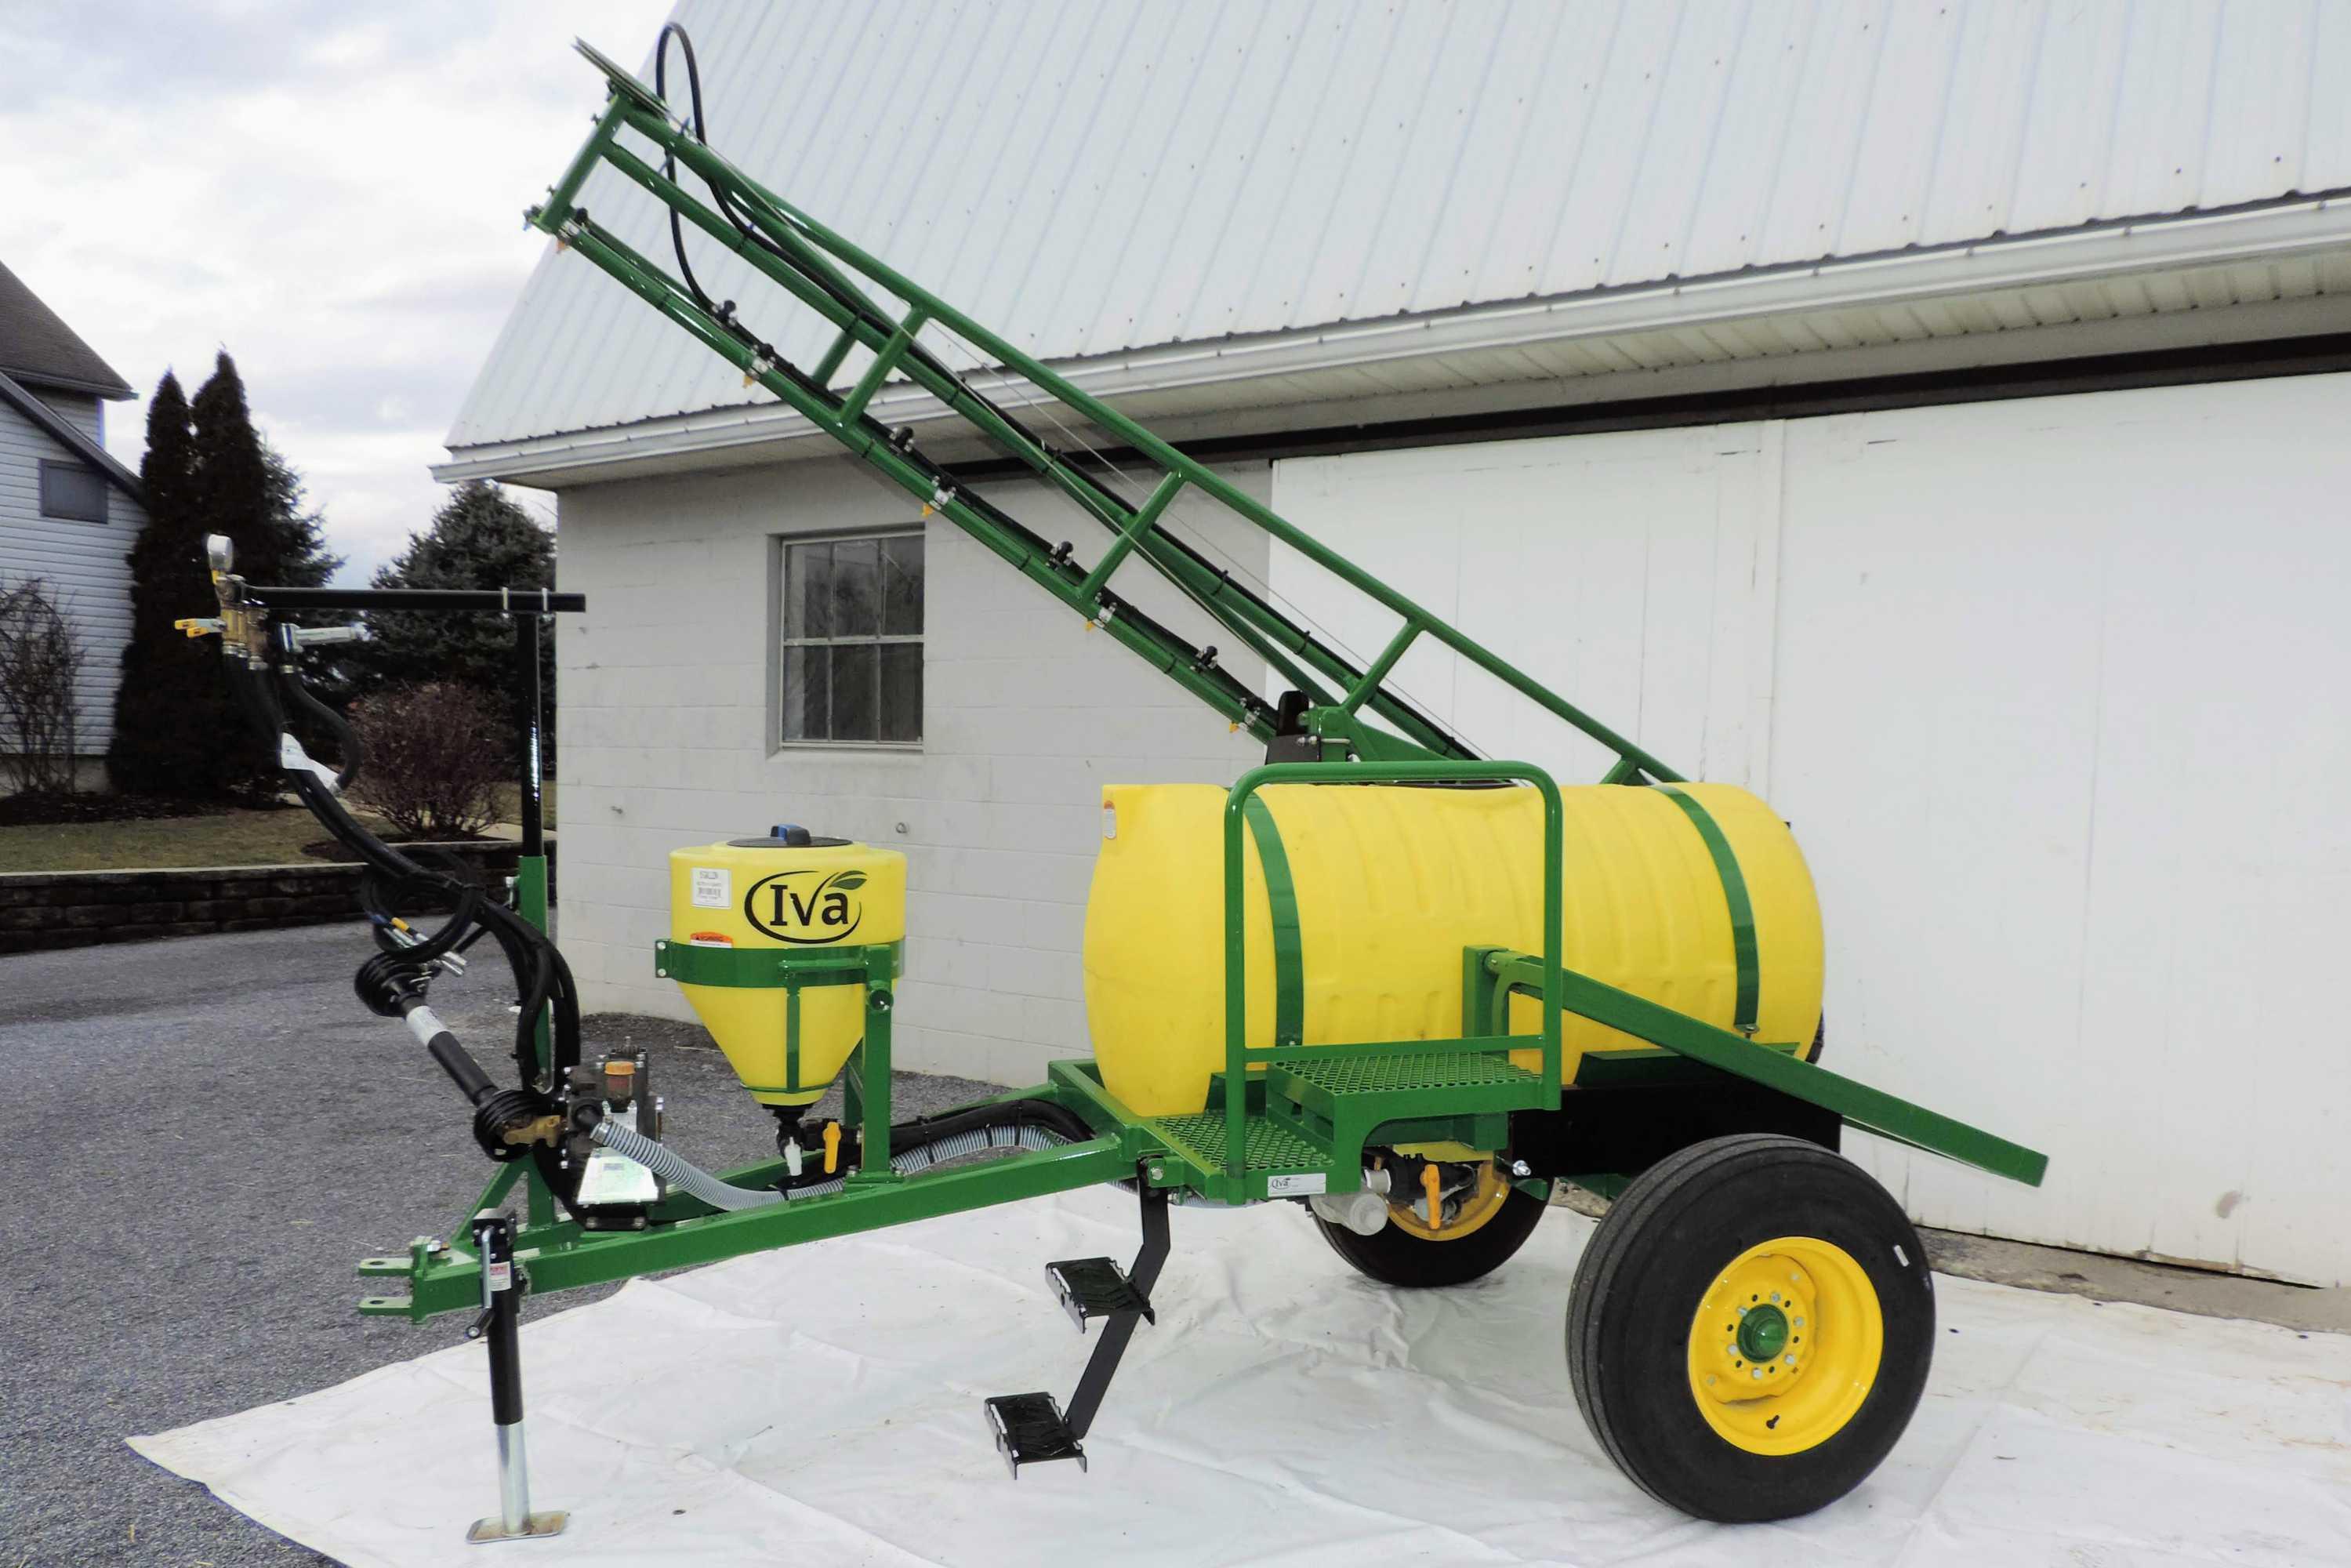 200 gallon trailer produce sprayer with 25' single sided boom